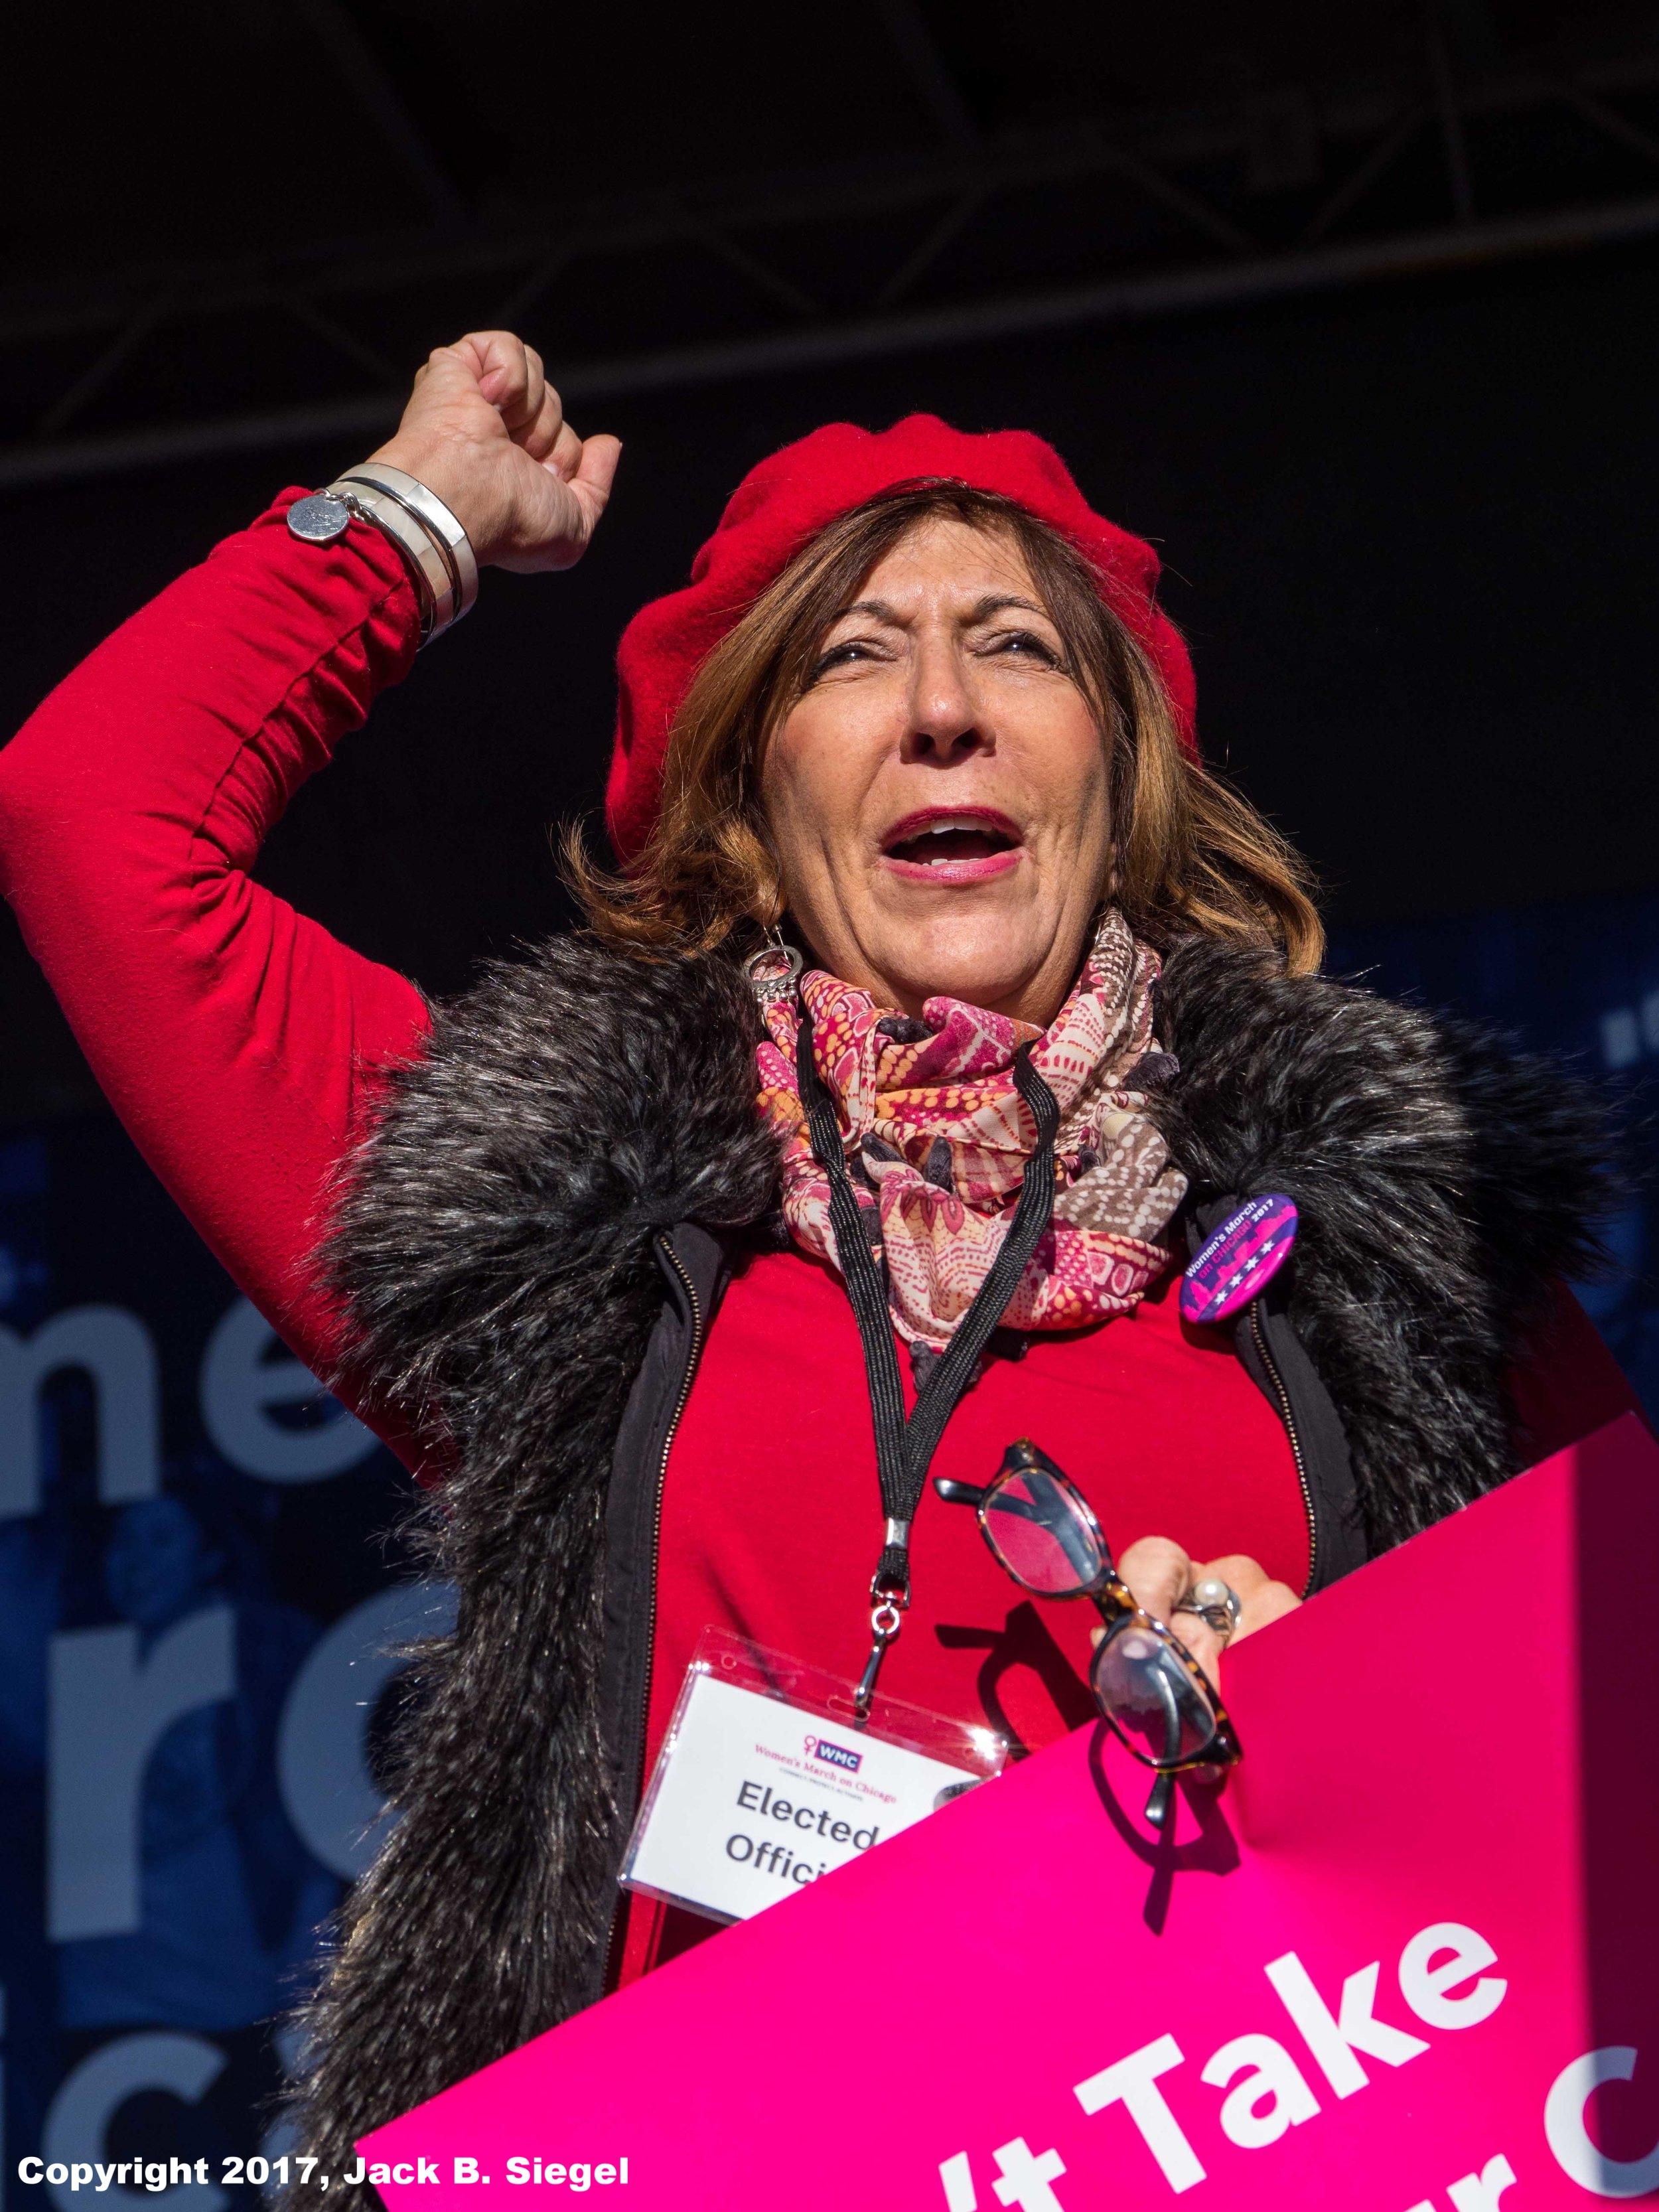 State Representative Sara Feigenholtz